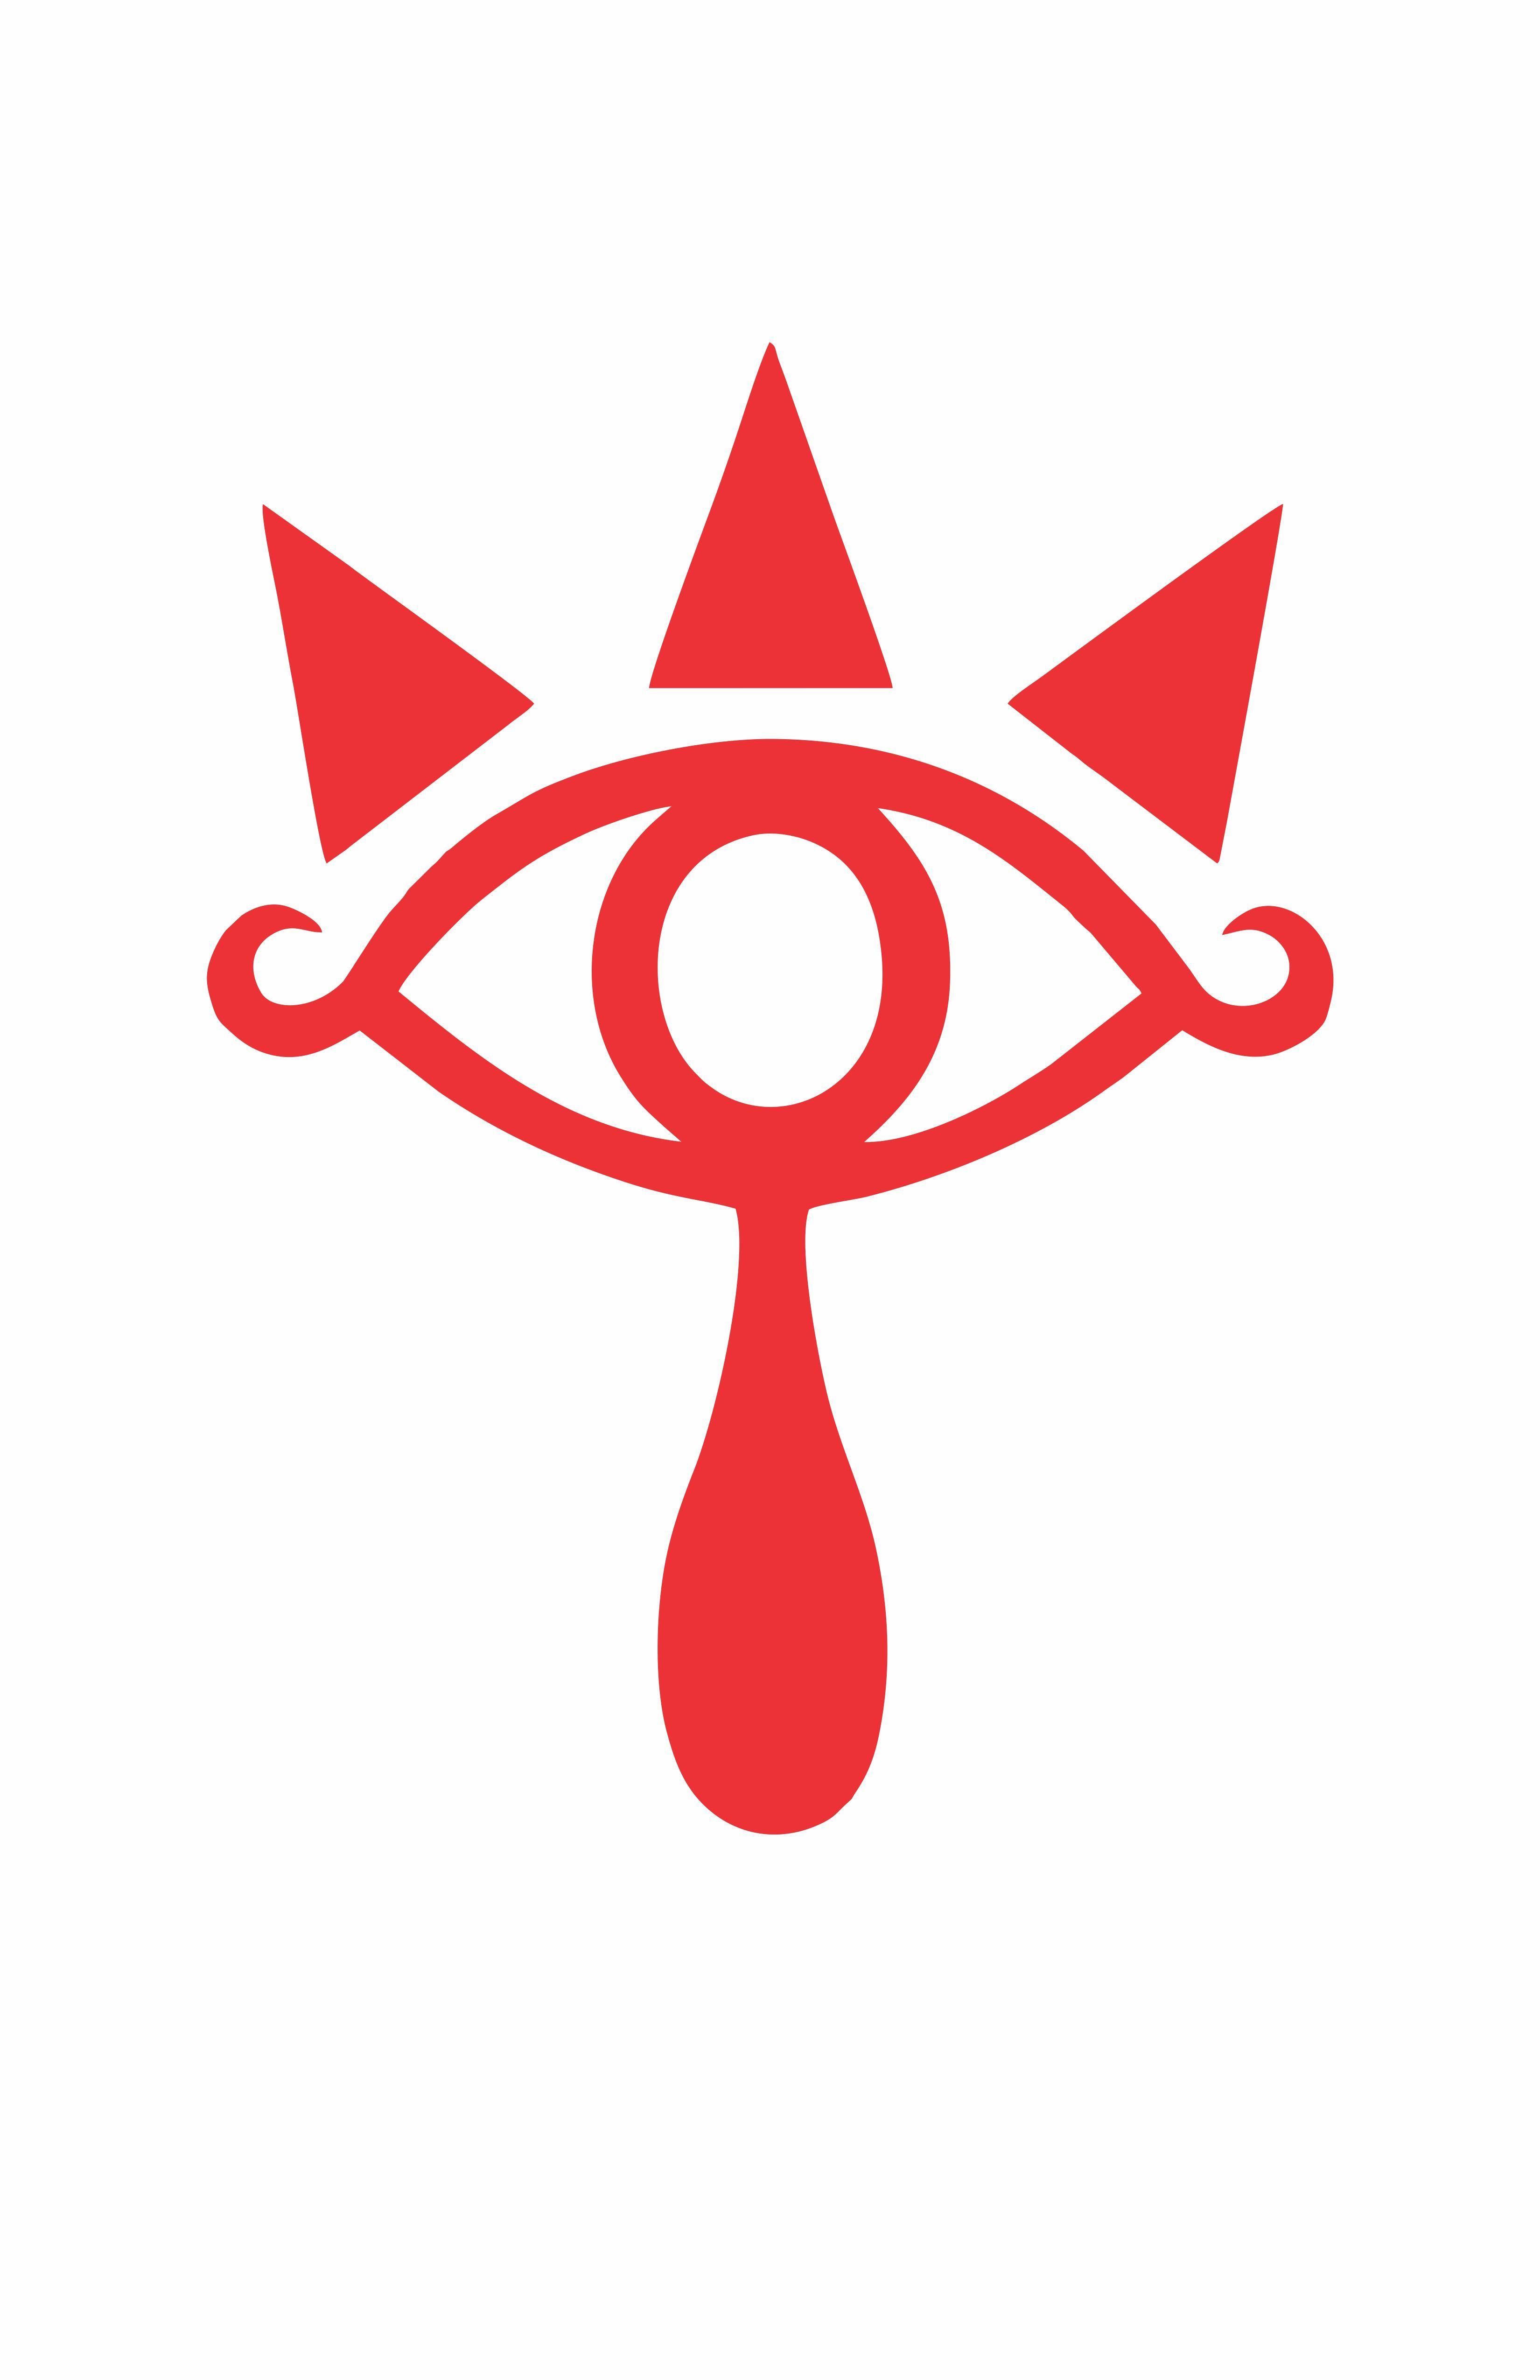 Sheikah Symbol from The Legend of Zelda Series Drax Shop